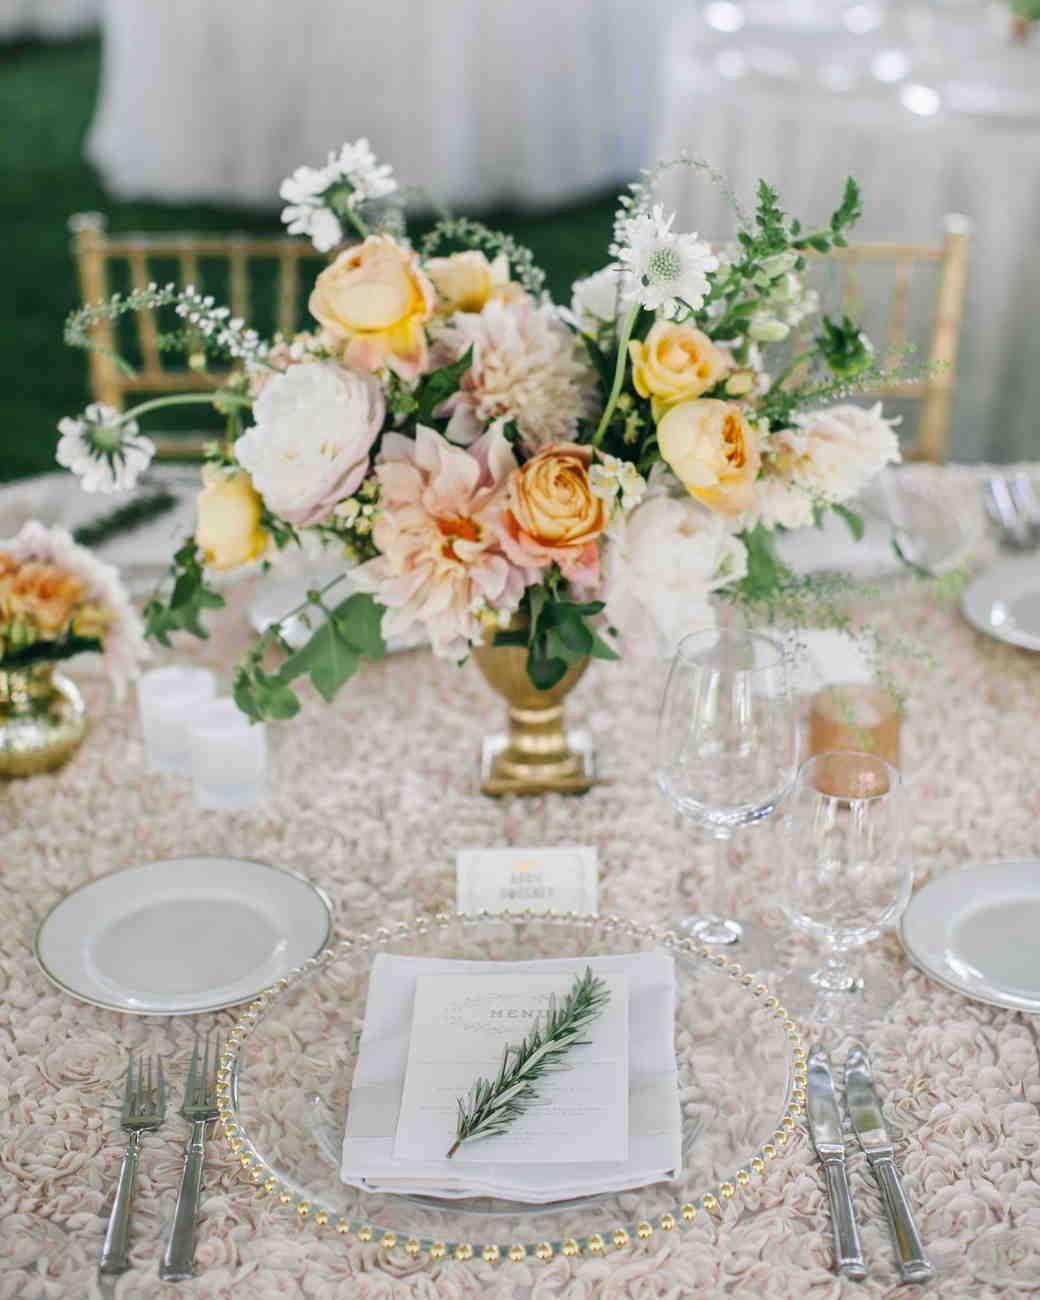 32 Classic Wedding Centerpieces We Love Classic Wedding Centerpieces Peonies Wedding Centerpieces Classic Wedding Flowers